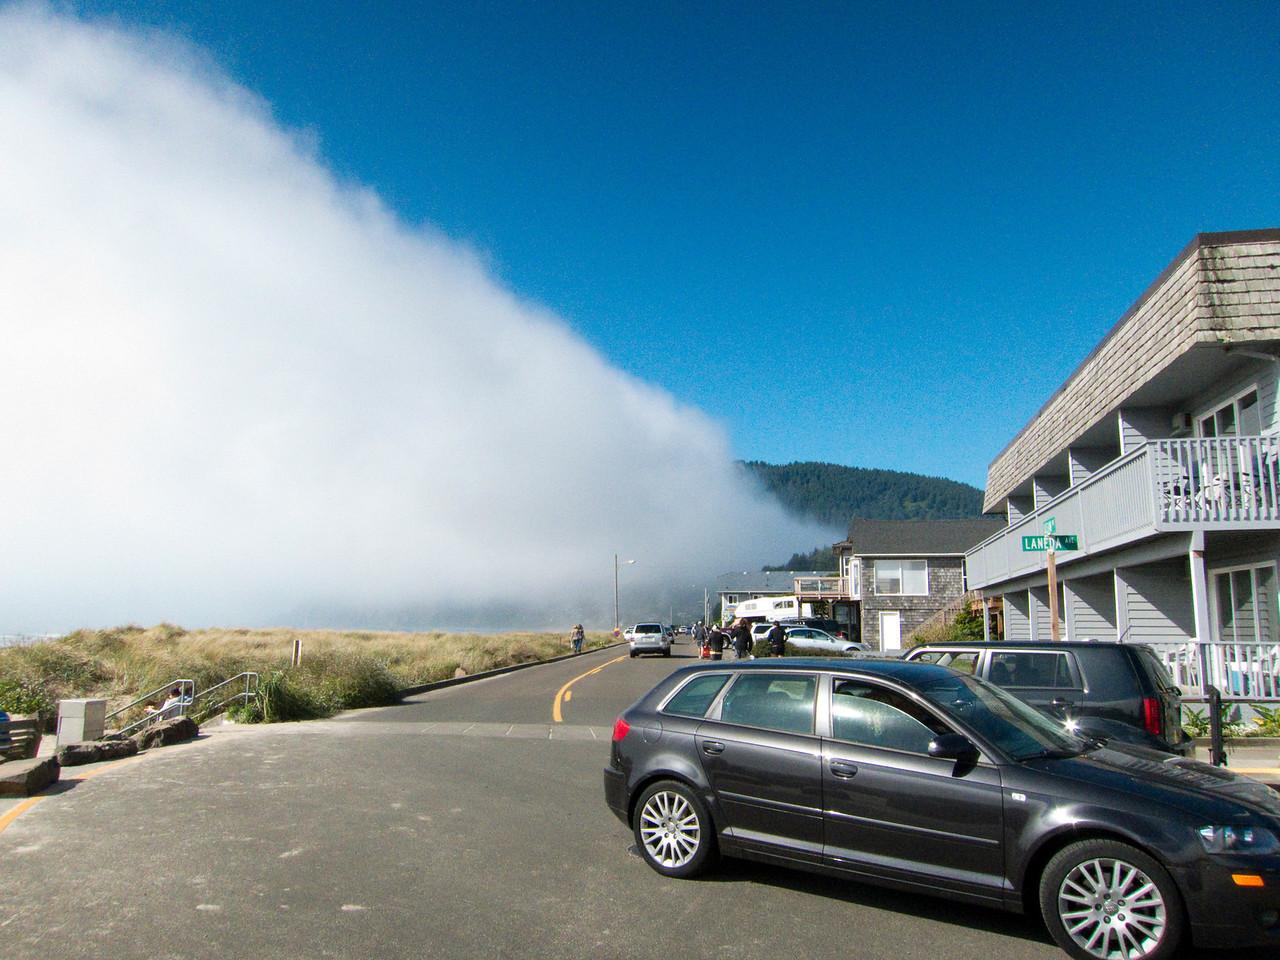 8.31.13  Extreme Fog Bank